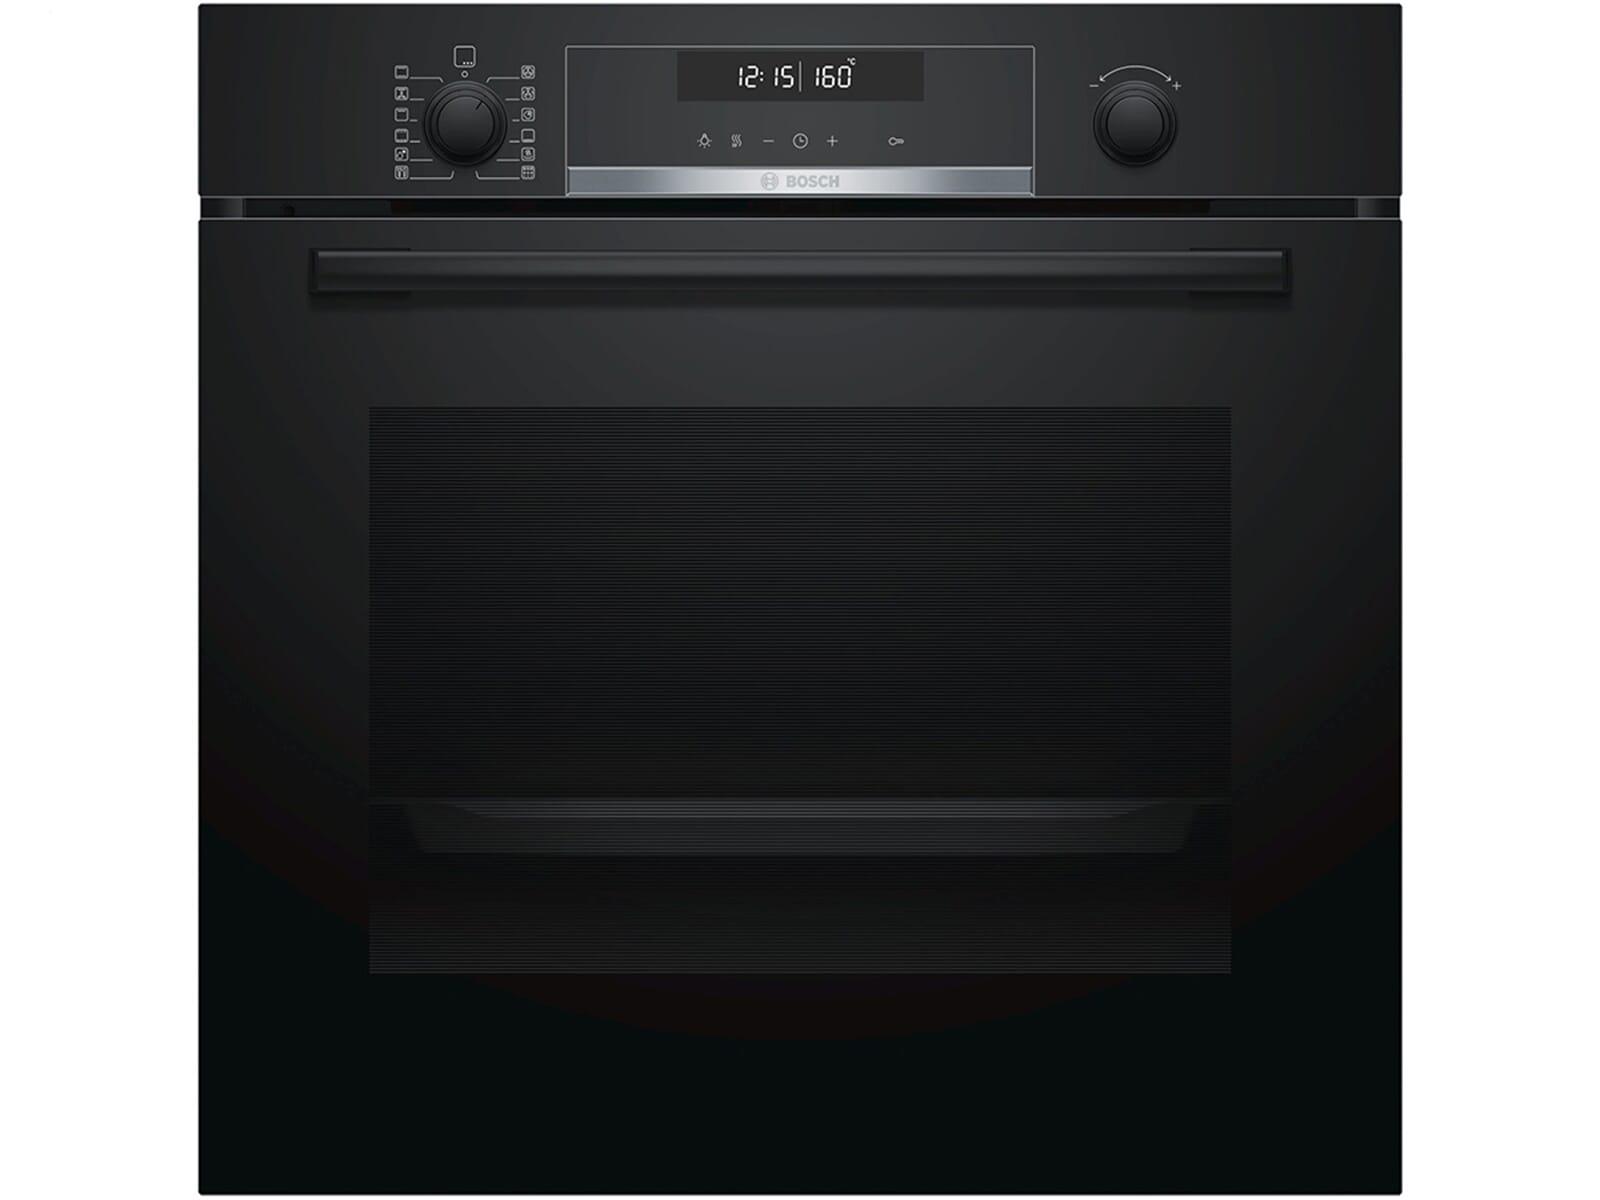 bosch hba578bb0 pyrolyse backofen vulkan schwarz. Black Bedroom Furniture Sets. Home Design Ideas